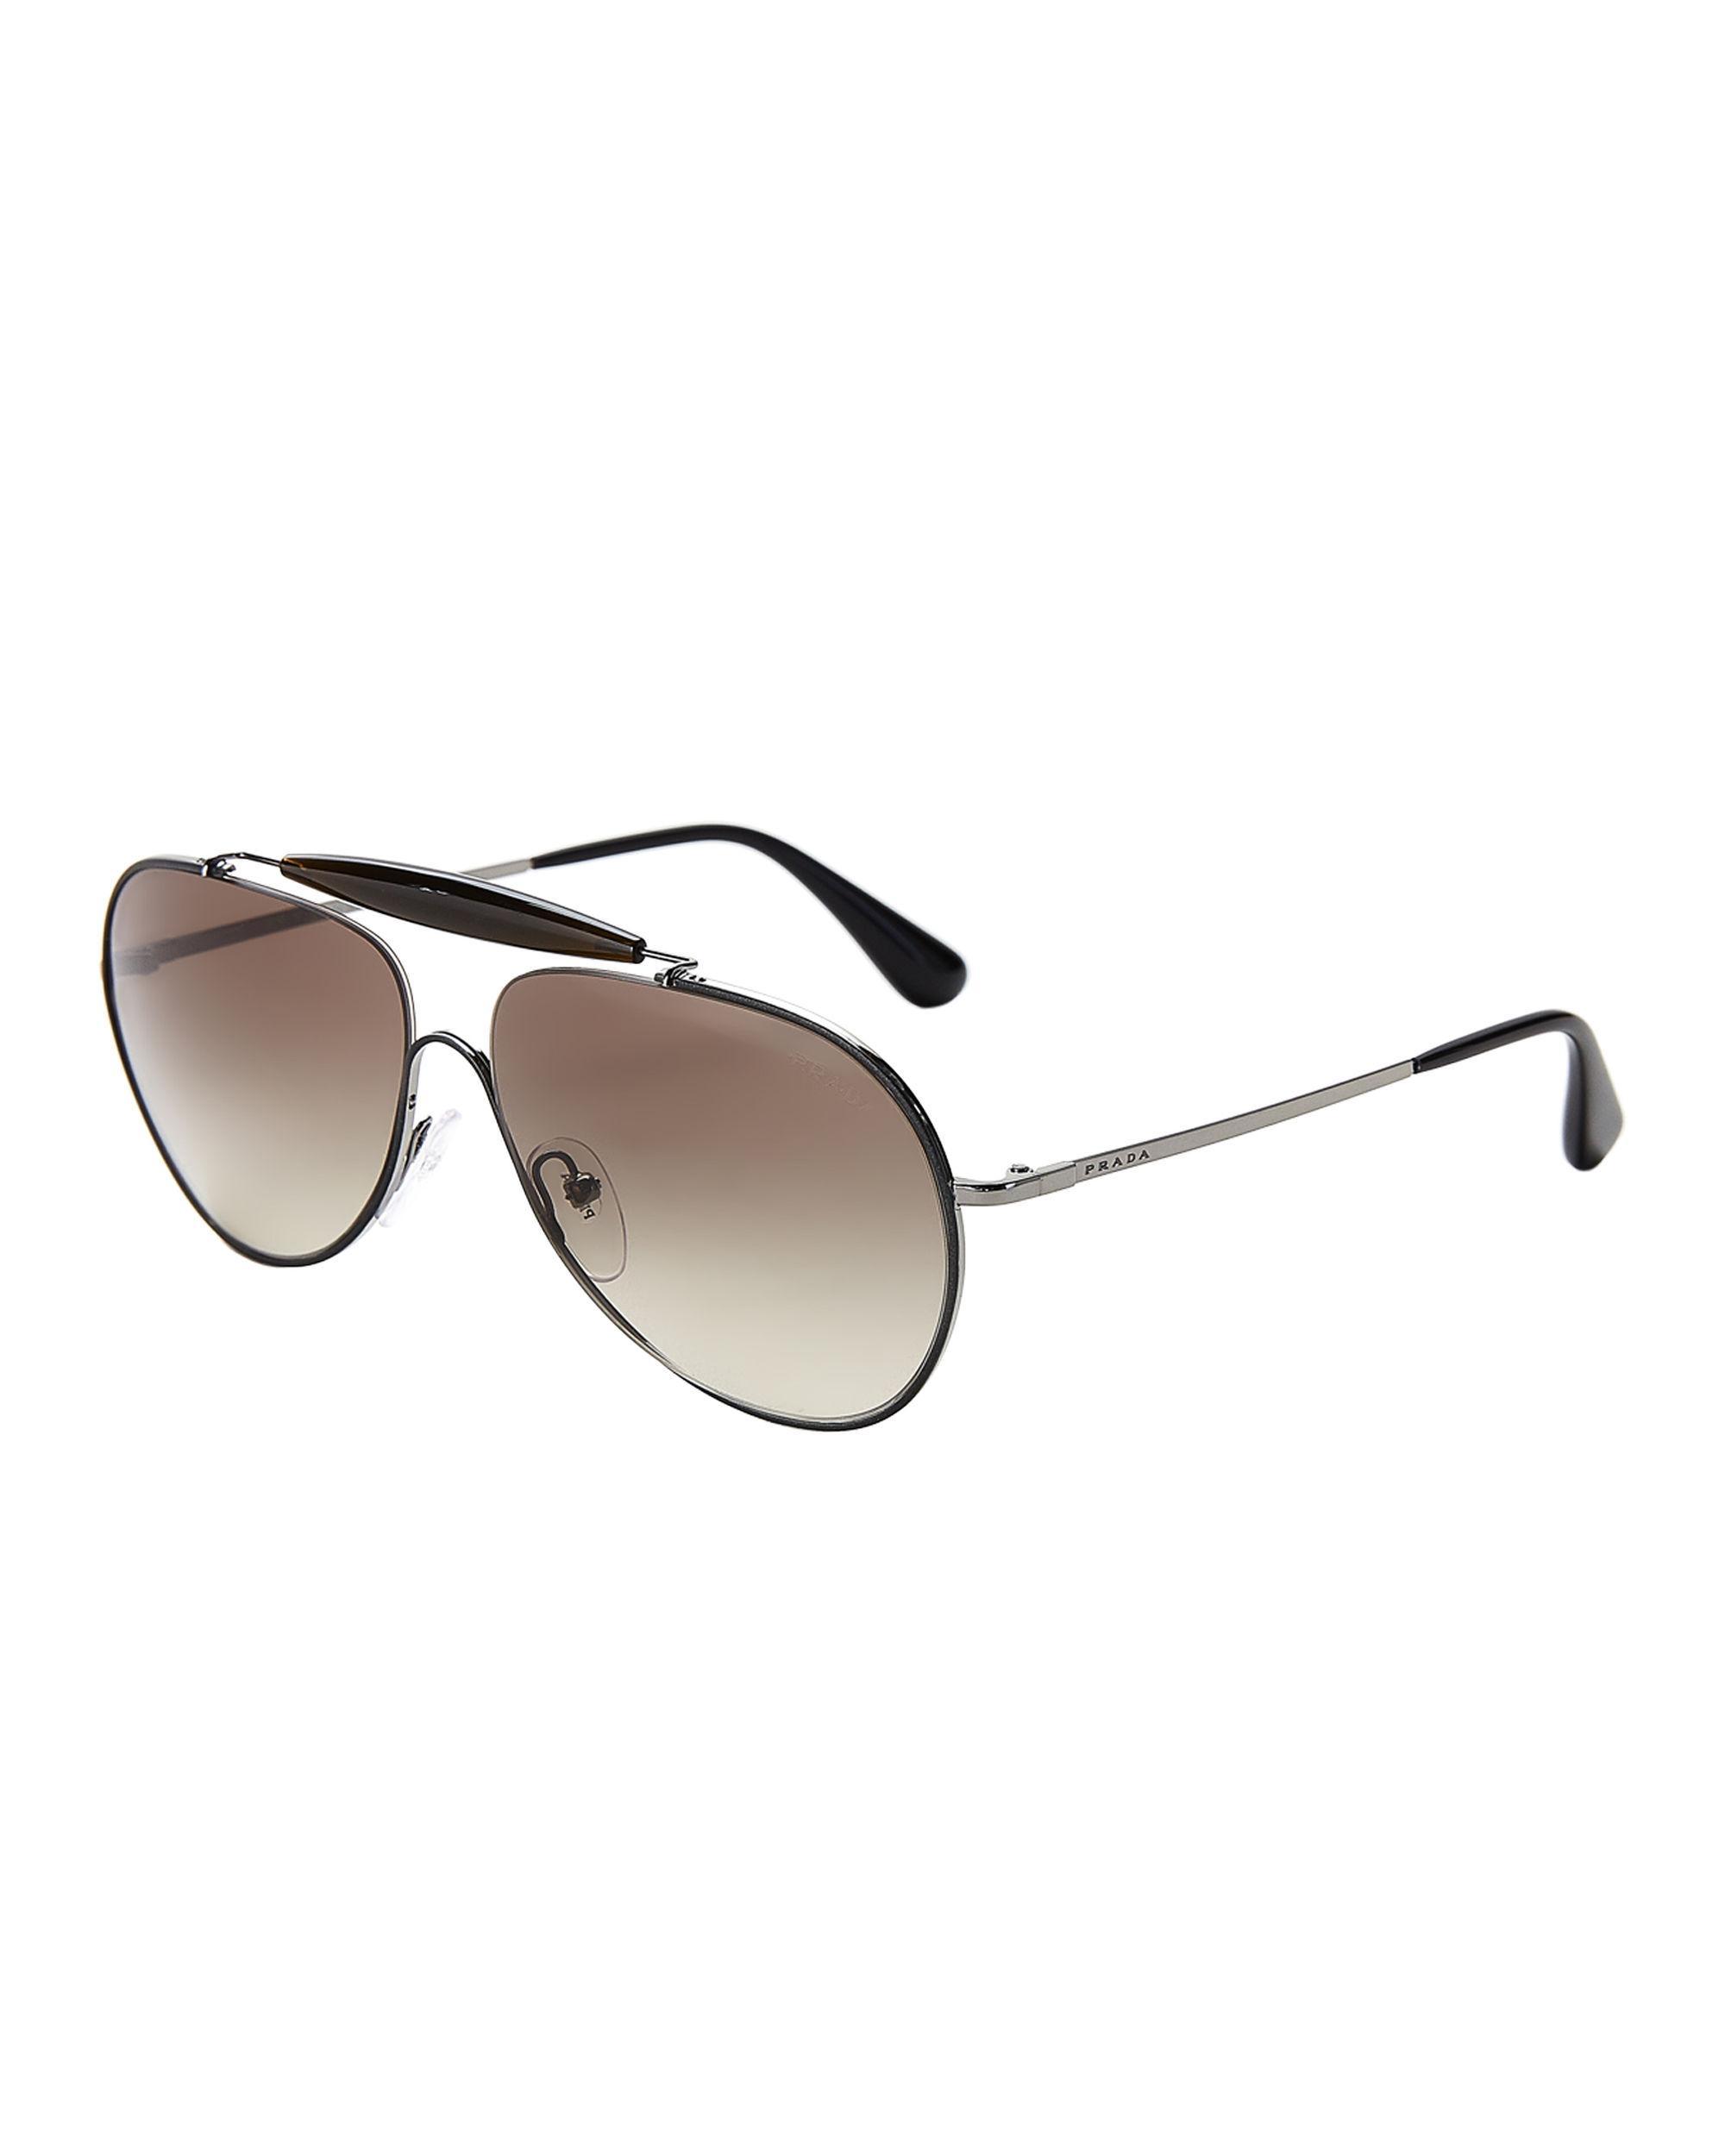 5d6f8aebf25c Prada - Spr 56s Black Aviator Sunglasses for Men - Lyst. View fullscreen